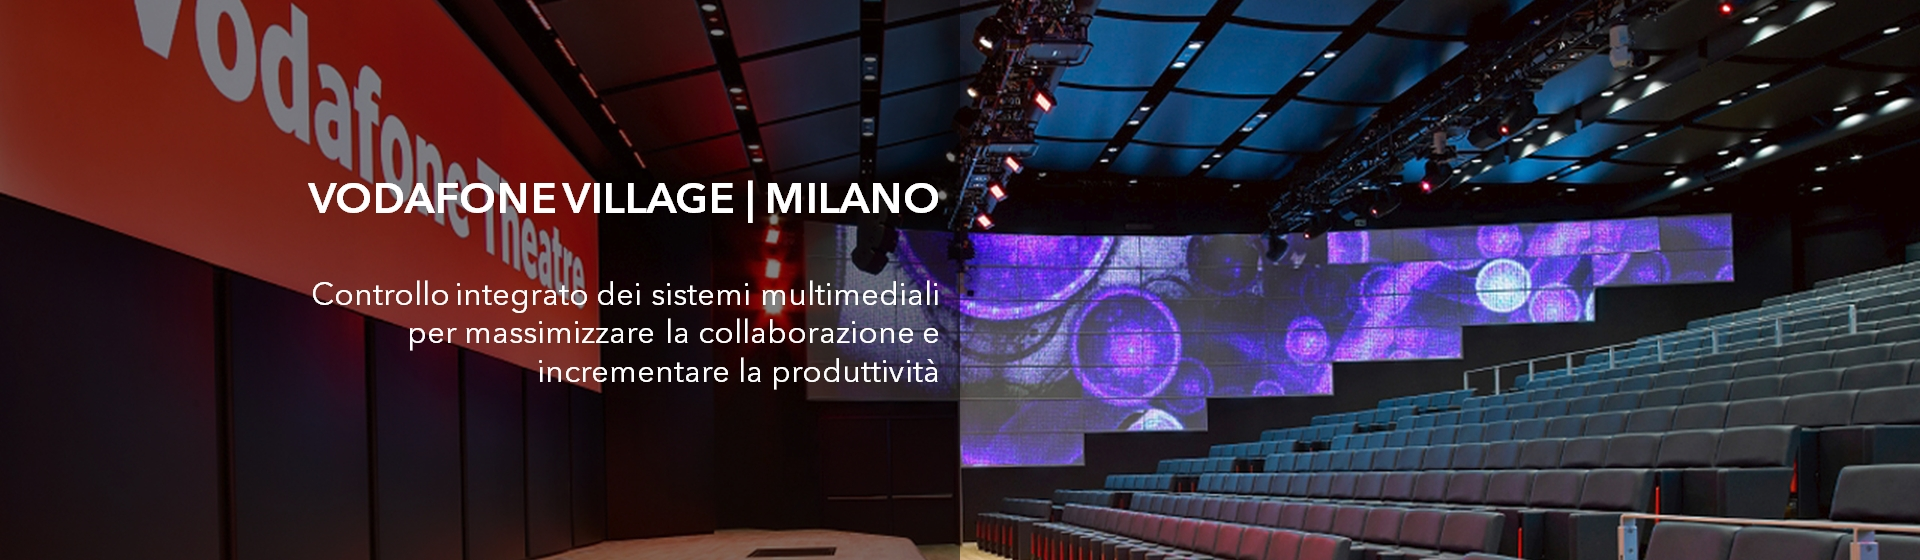 slide_vodafone_milano_3